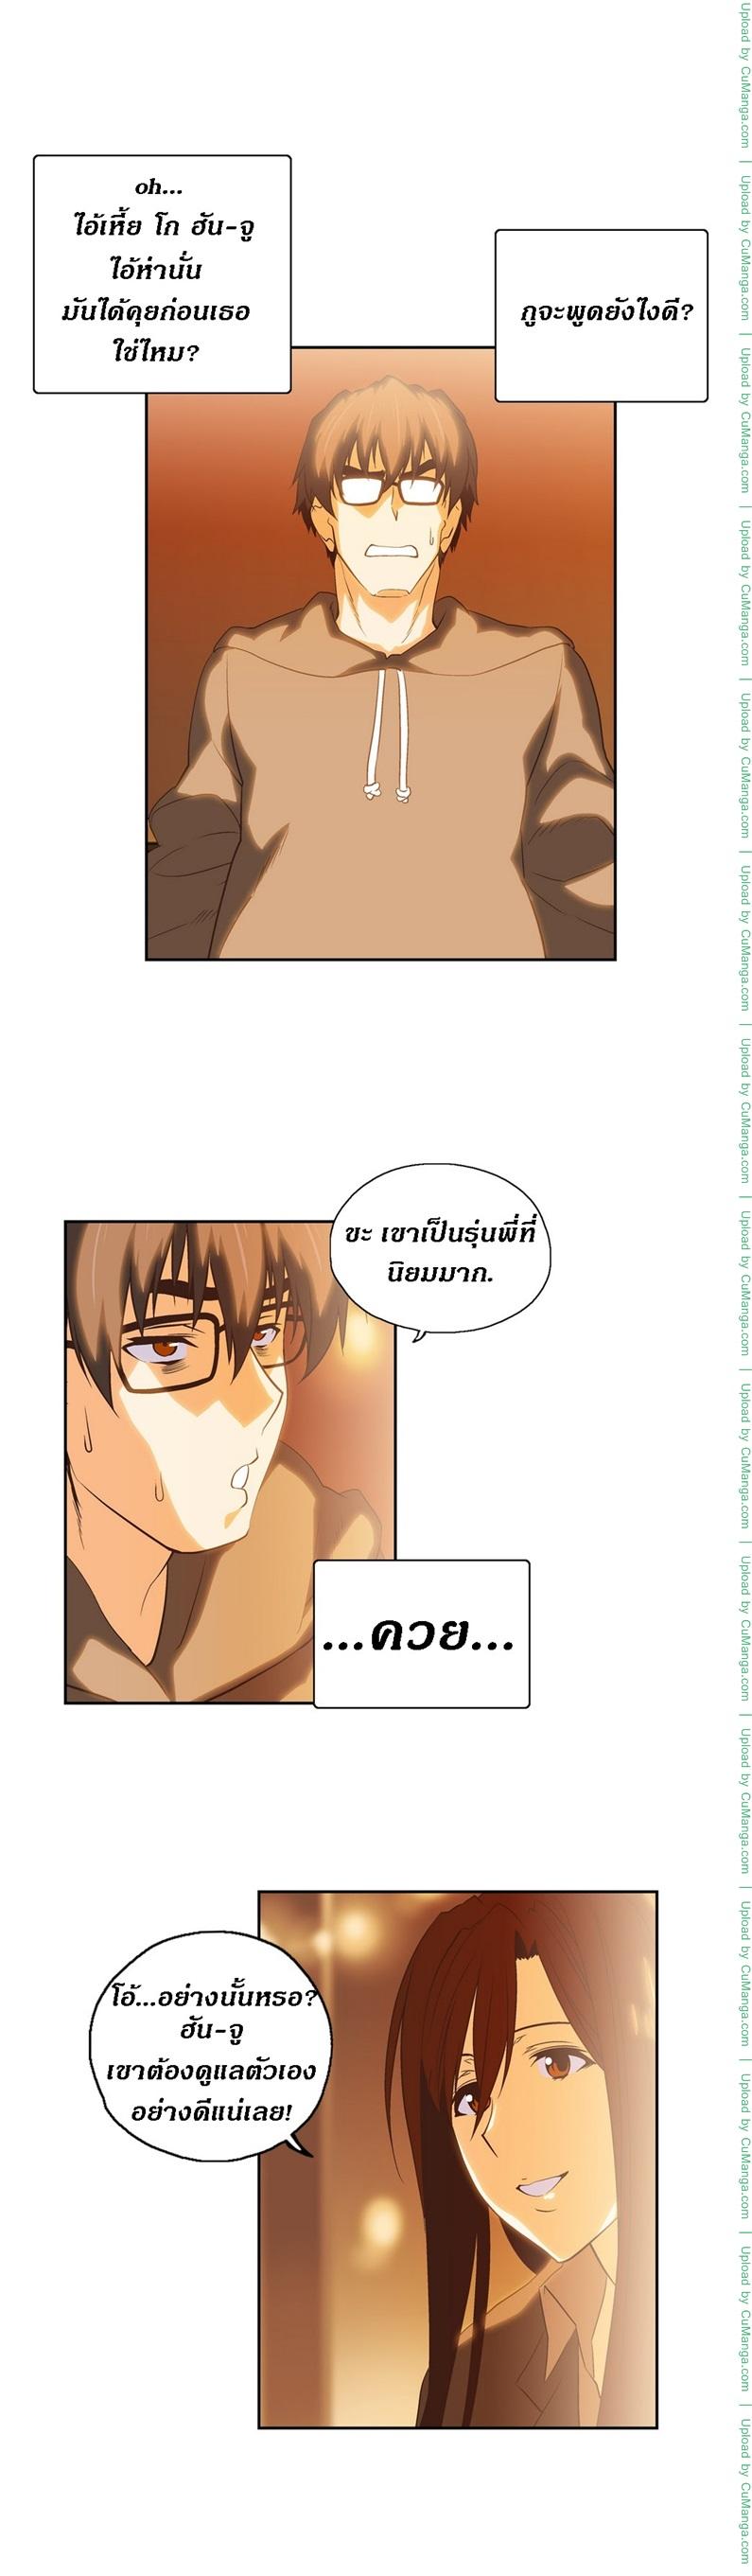 SStudy 45 - หน้า 7